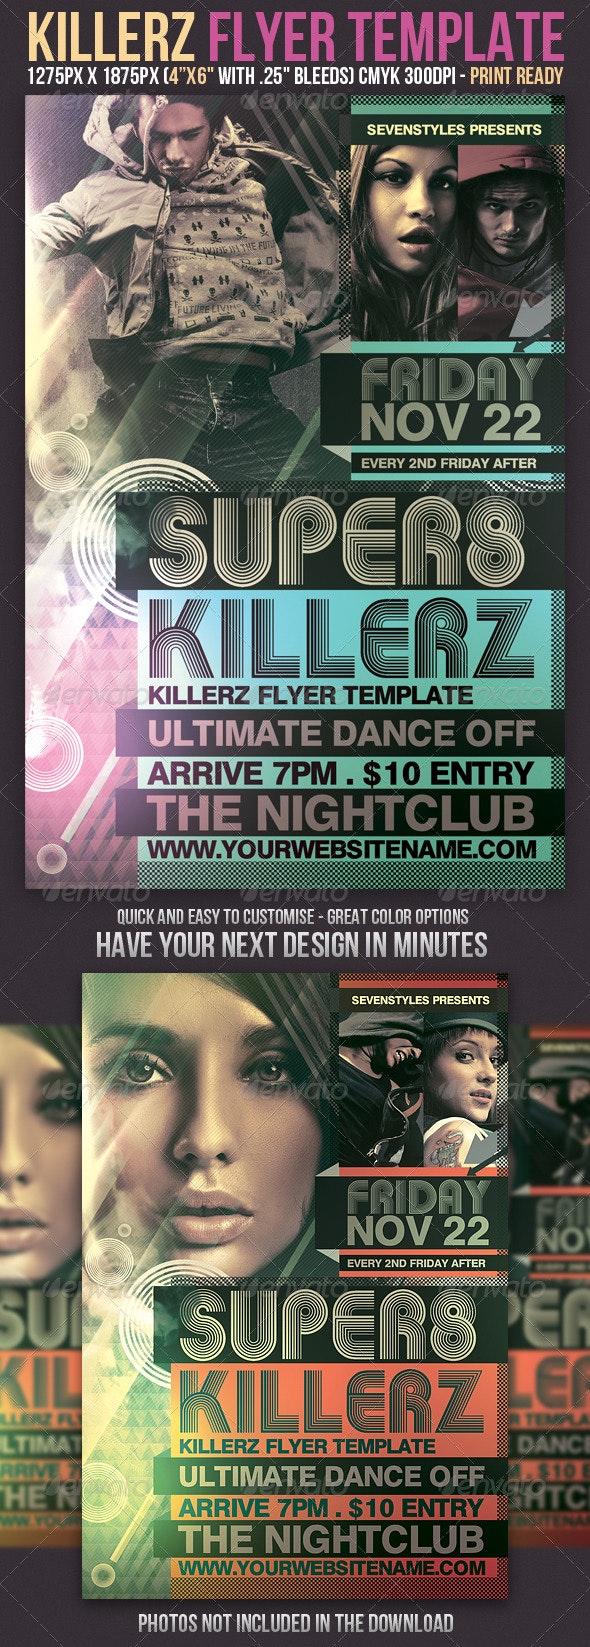 Killerz Flyer Template - Clubs & Parties Events